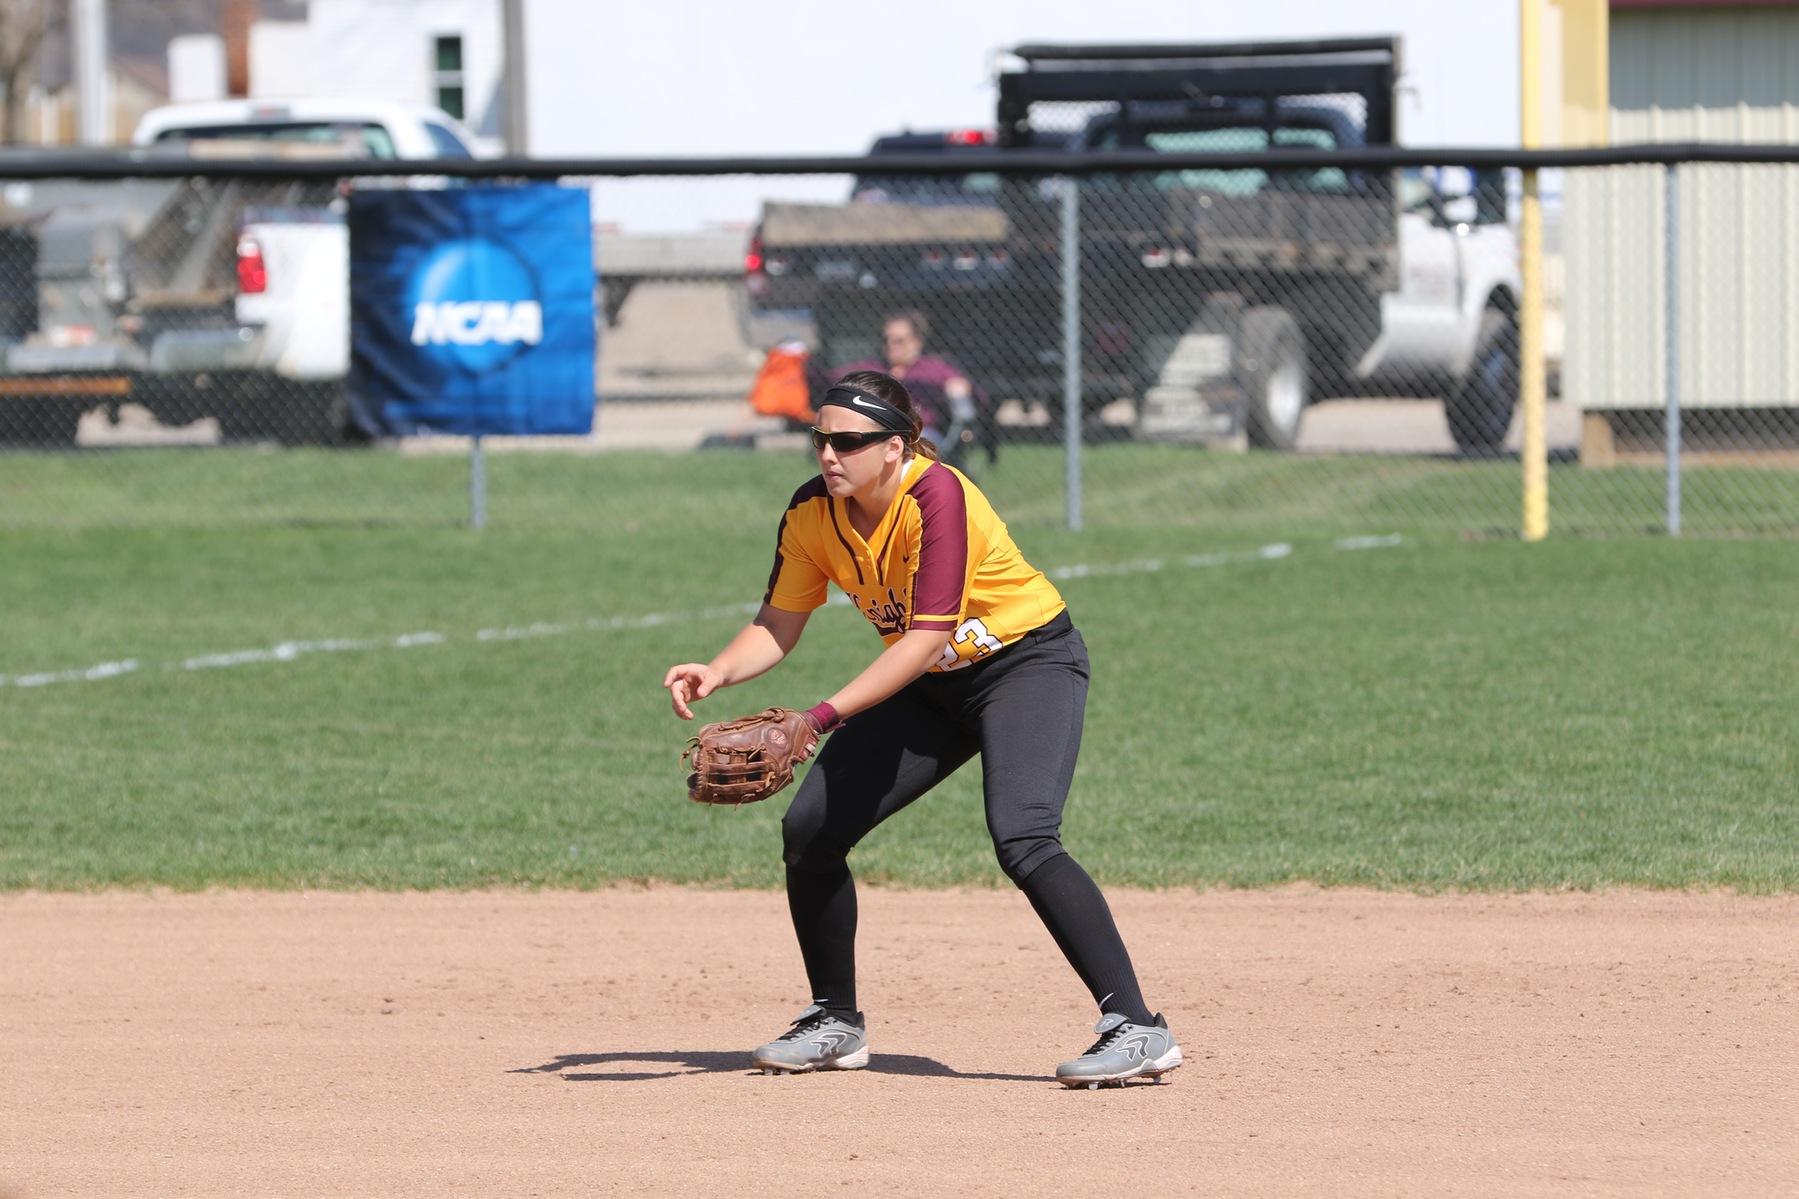 Softball competition photo